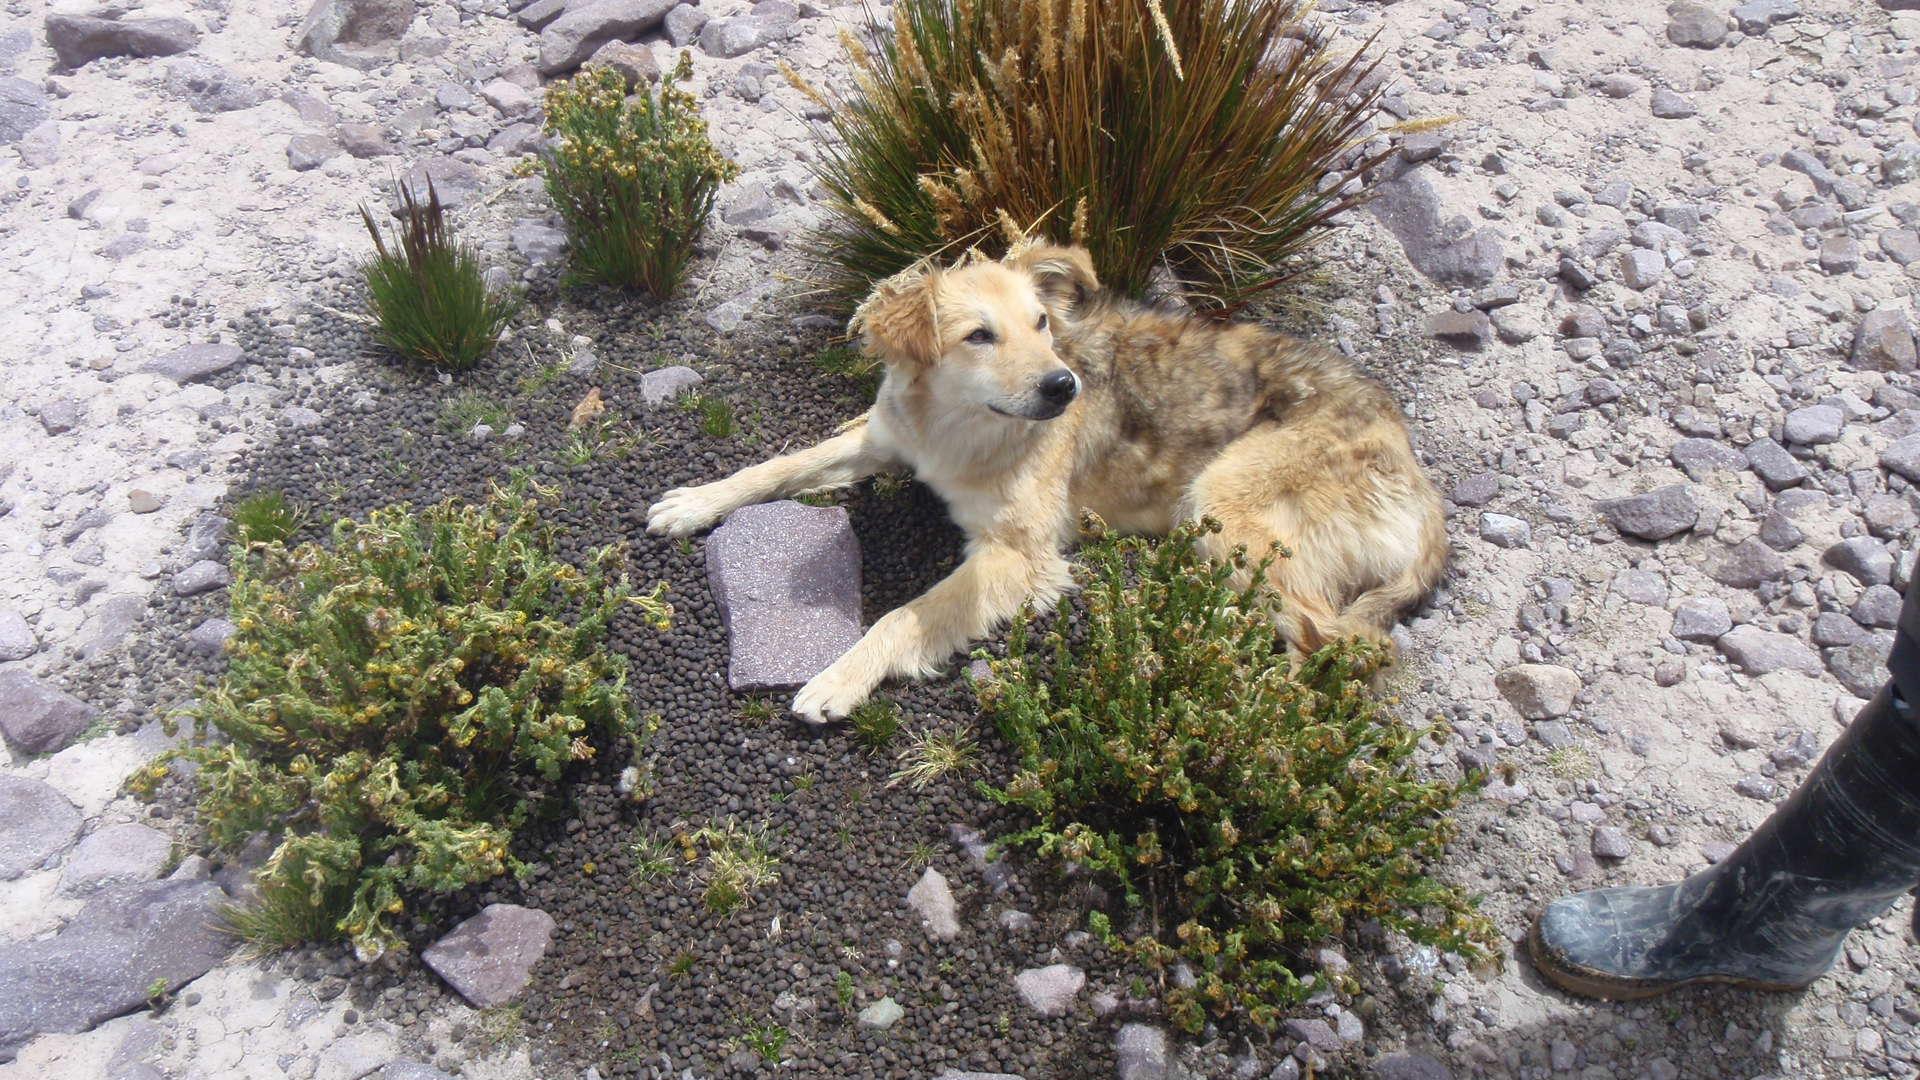 Plant a garden under a glacier - CU Boulder scientists replicate a decades-old vicuña experiment